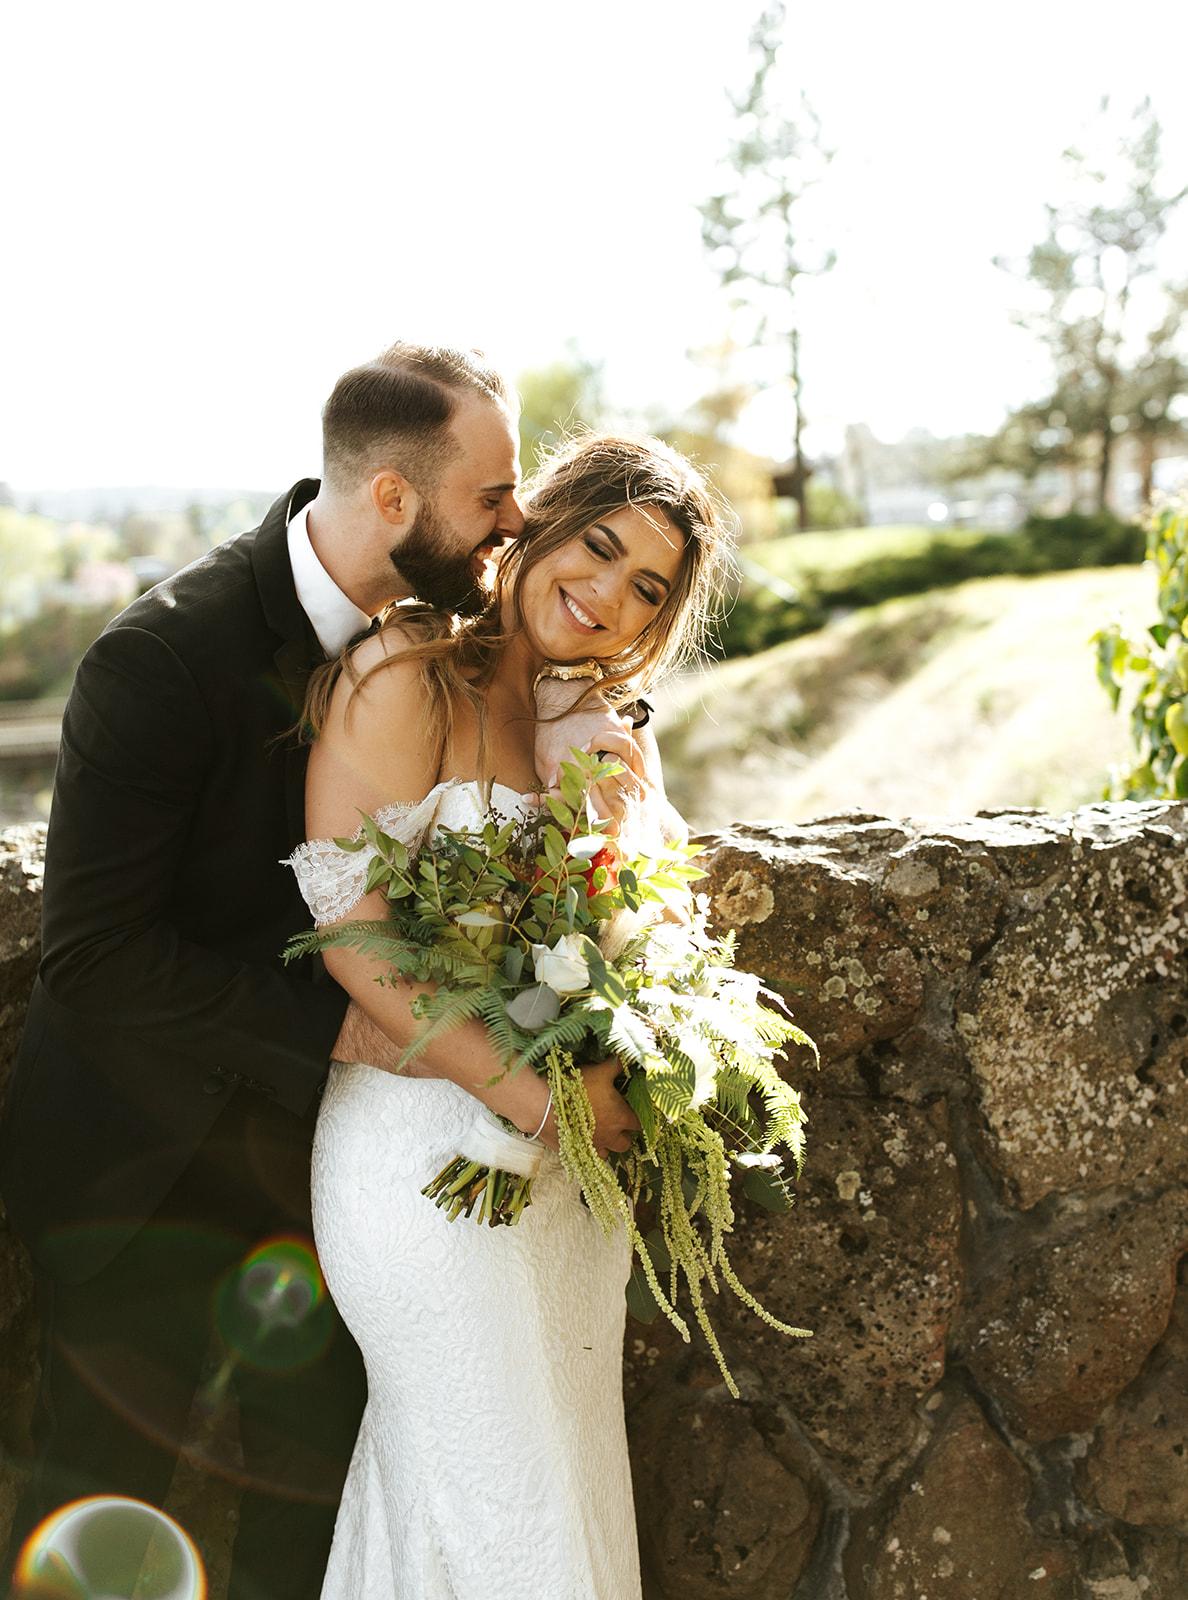 Chateau Rive Spokane Wedding Spokane Blog Dress bride groom